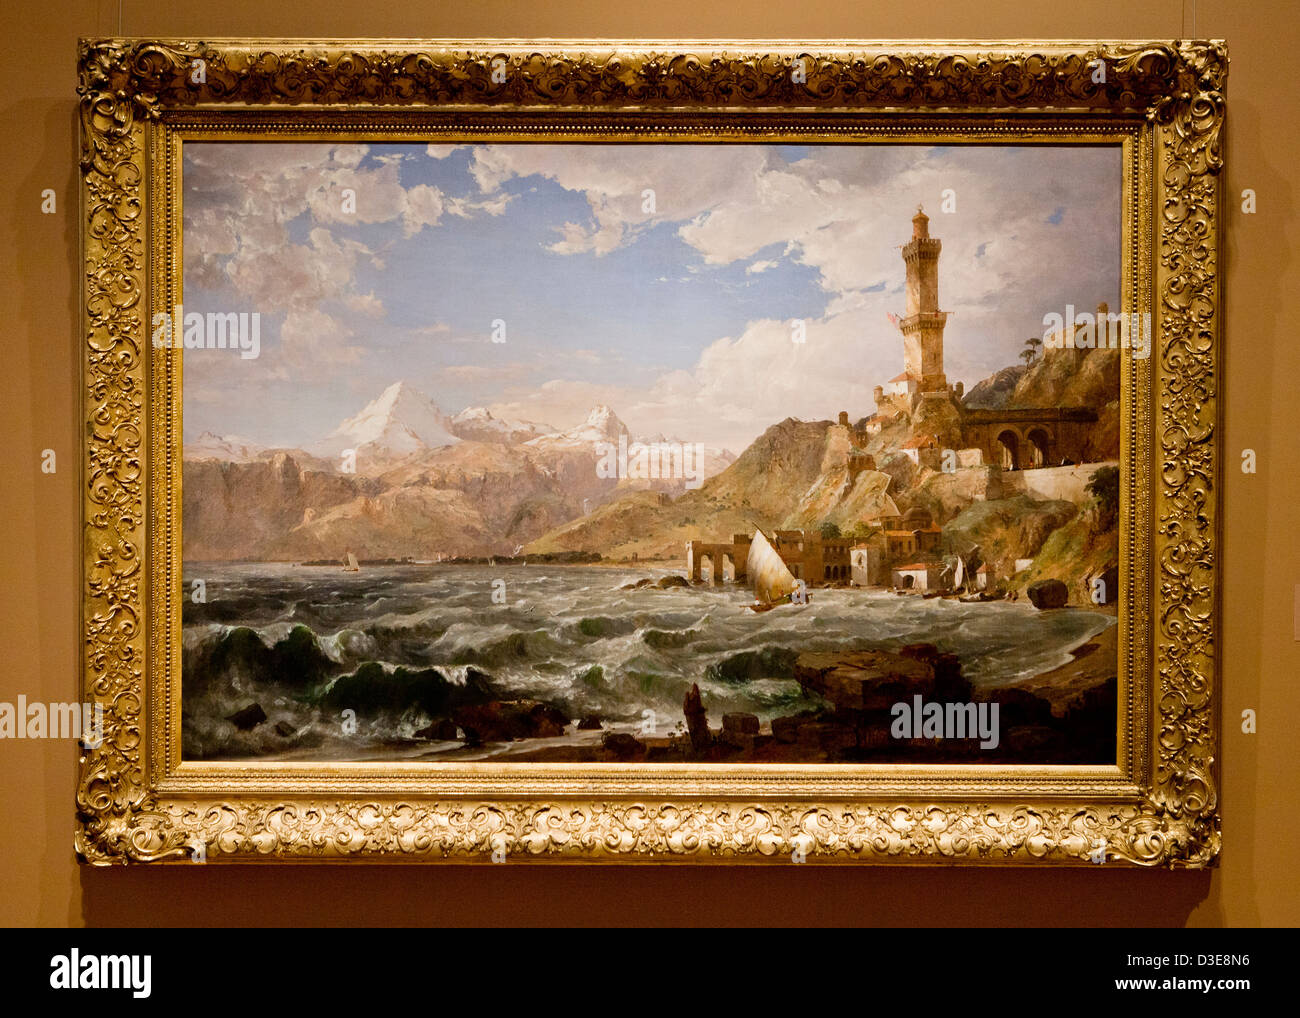 The Coast of Genoa by Jasper Francis Cropsey, 1854 - Stock Image